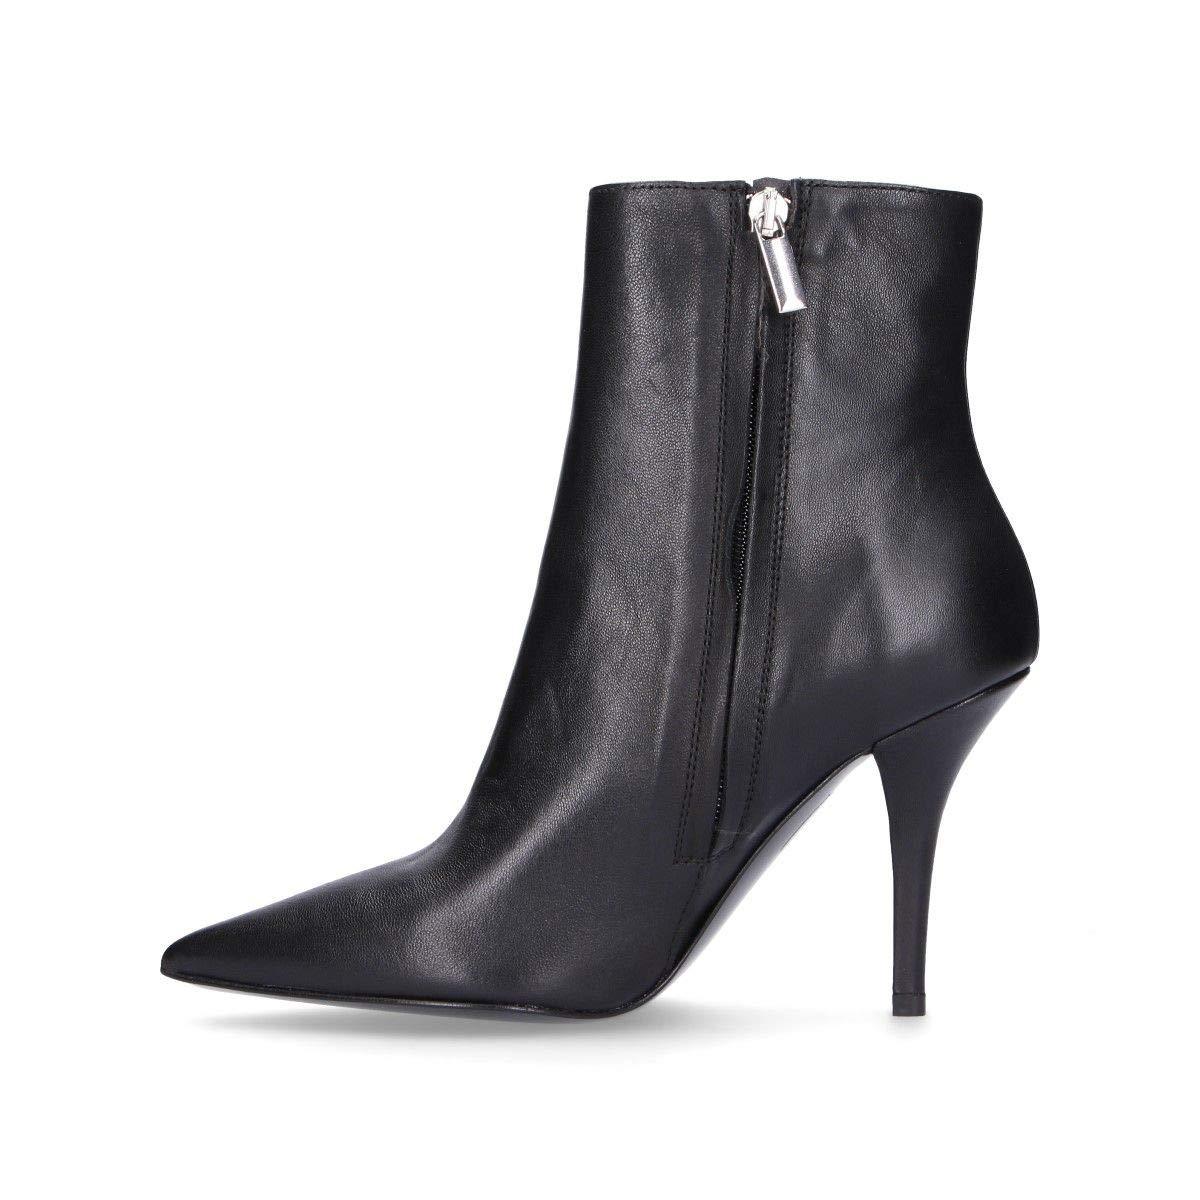 Season Permanent DI LUNA Luxury Fashion Womens C2960BLACK Black Ankle Boots